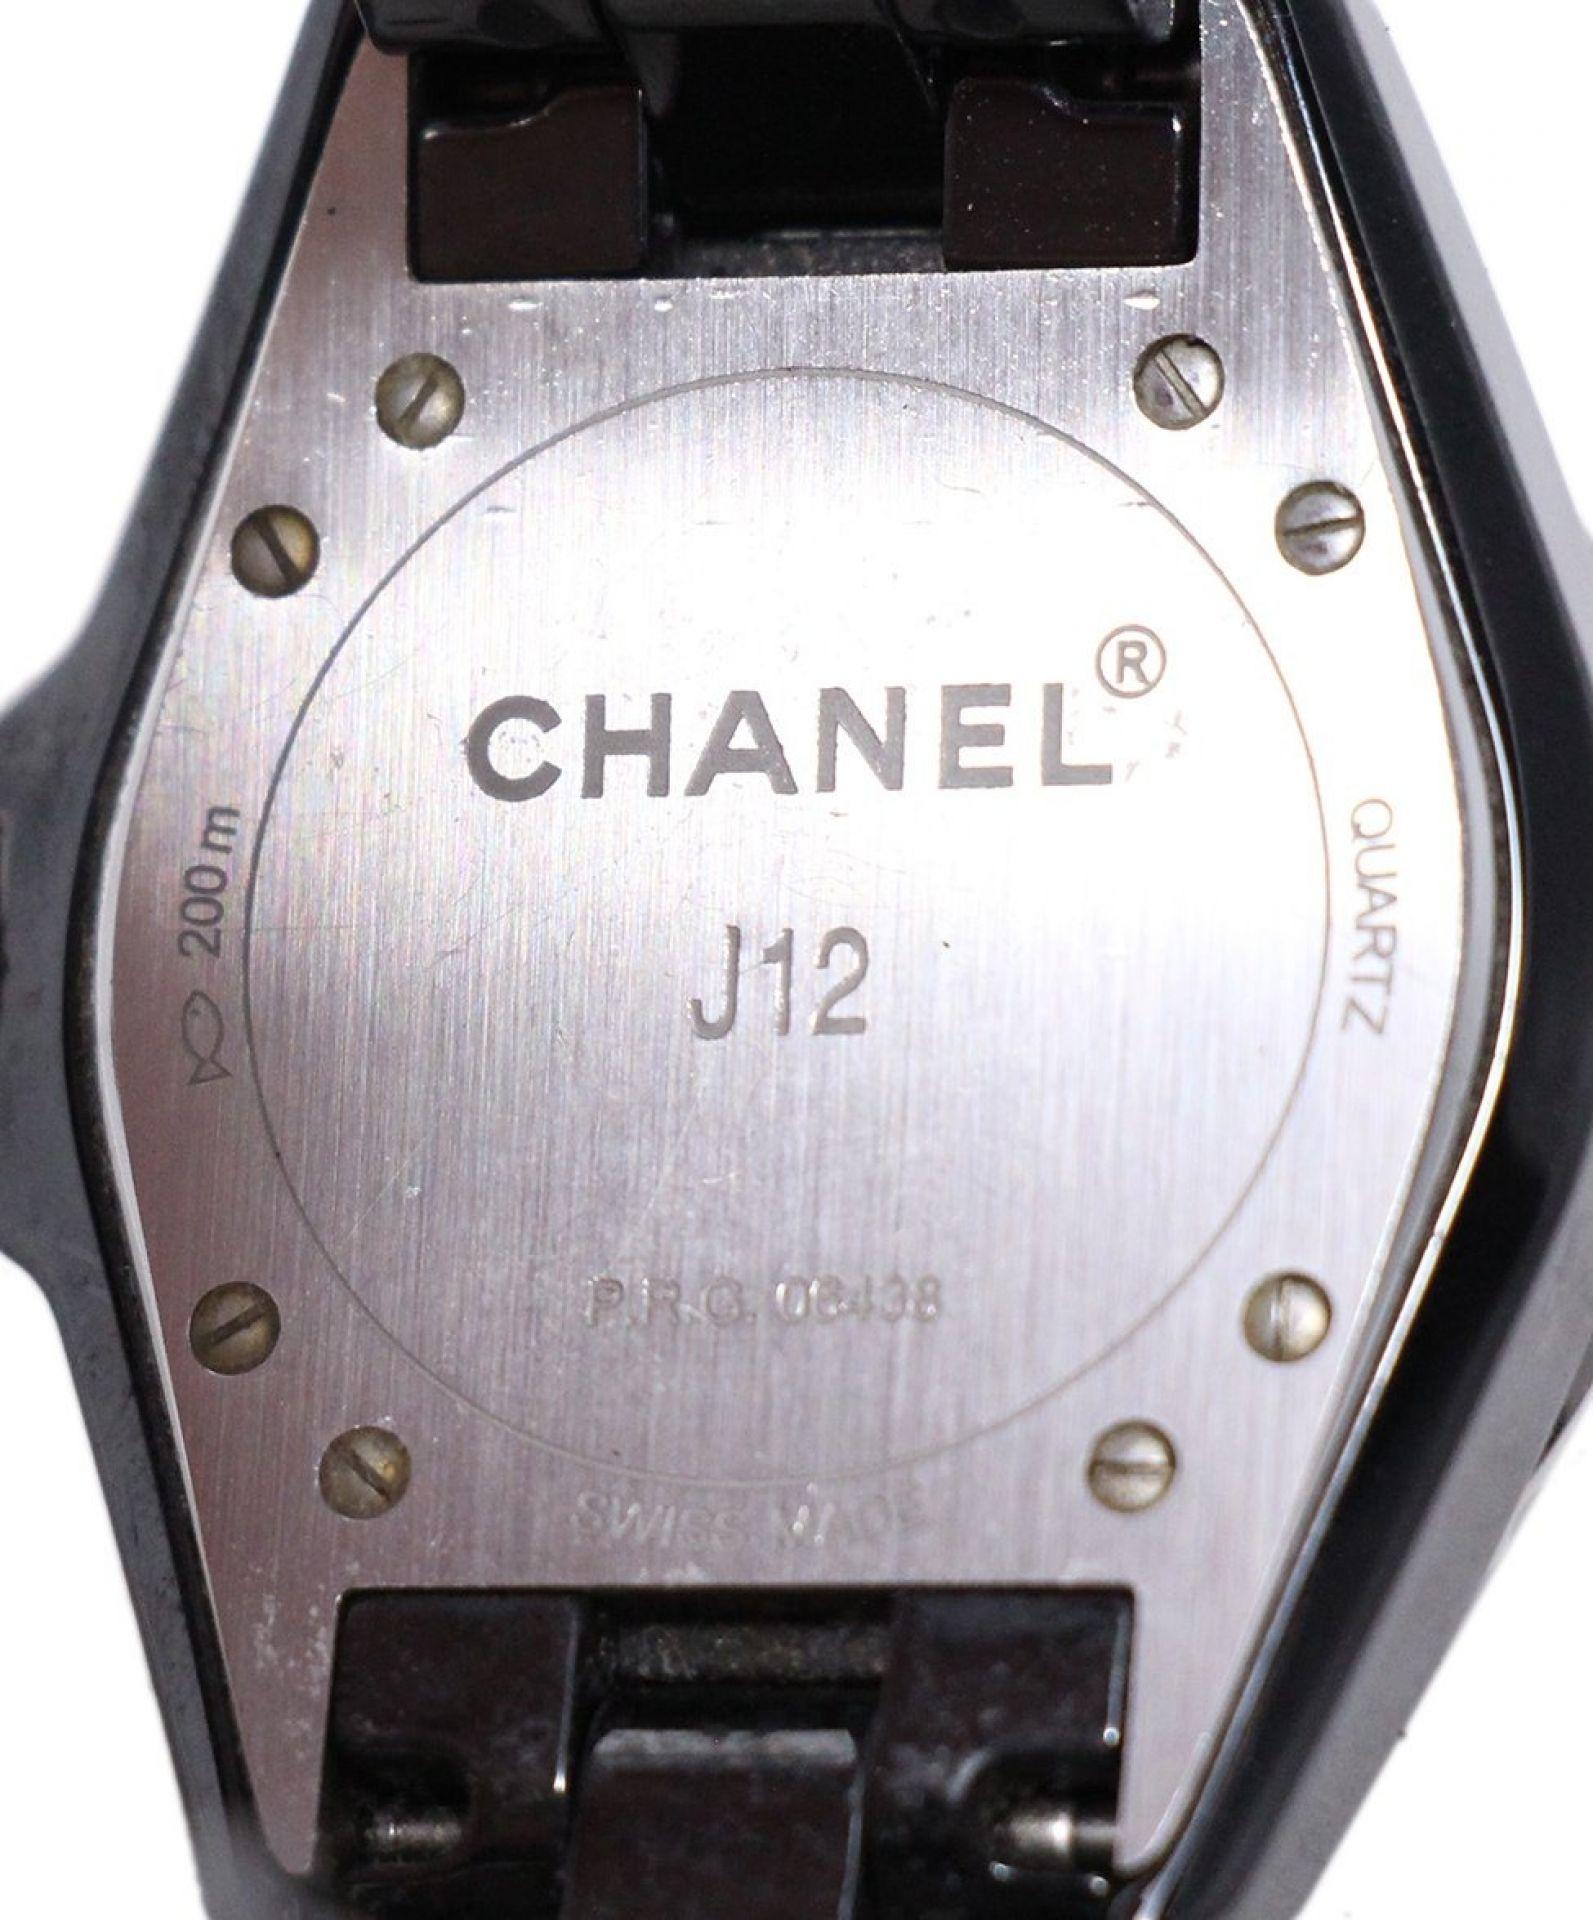 CHANEL BLACK GUNMETAL DIAMOND WATCH